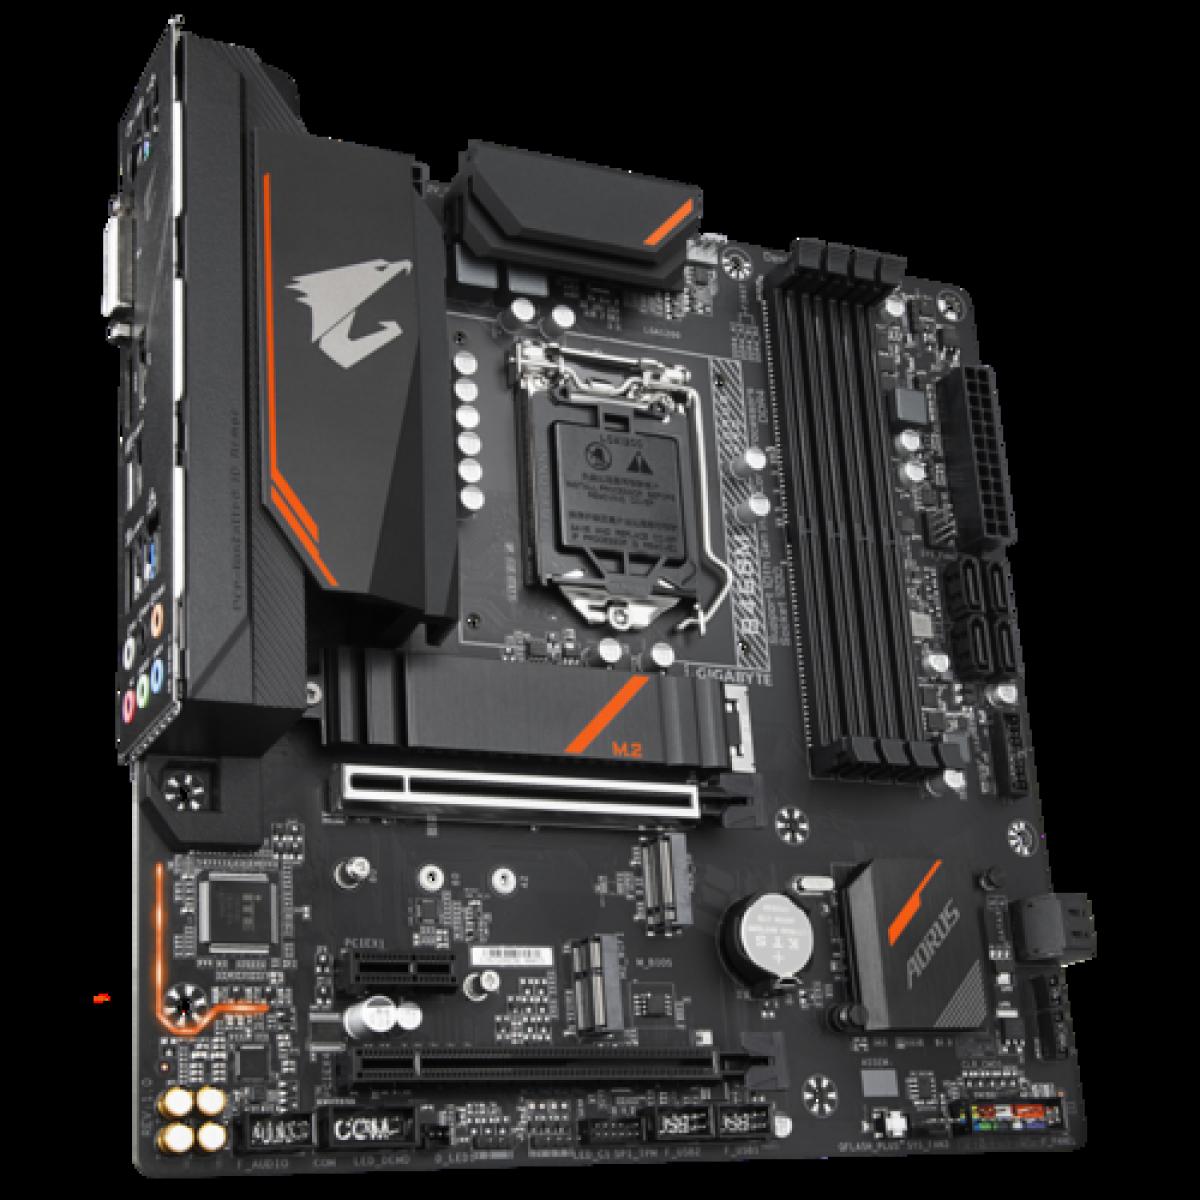 Placa Mãe Gigabyte B460M AORUS PRO, Chipset B460, Intel LGA 1200, mATX, DDR4